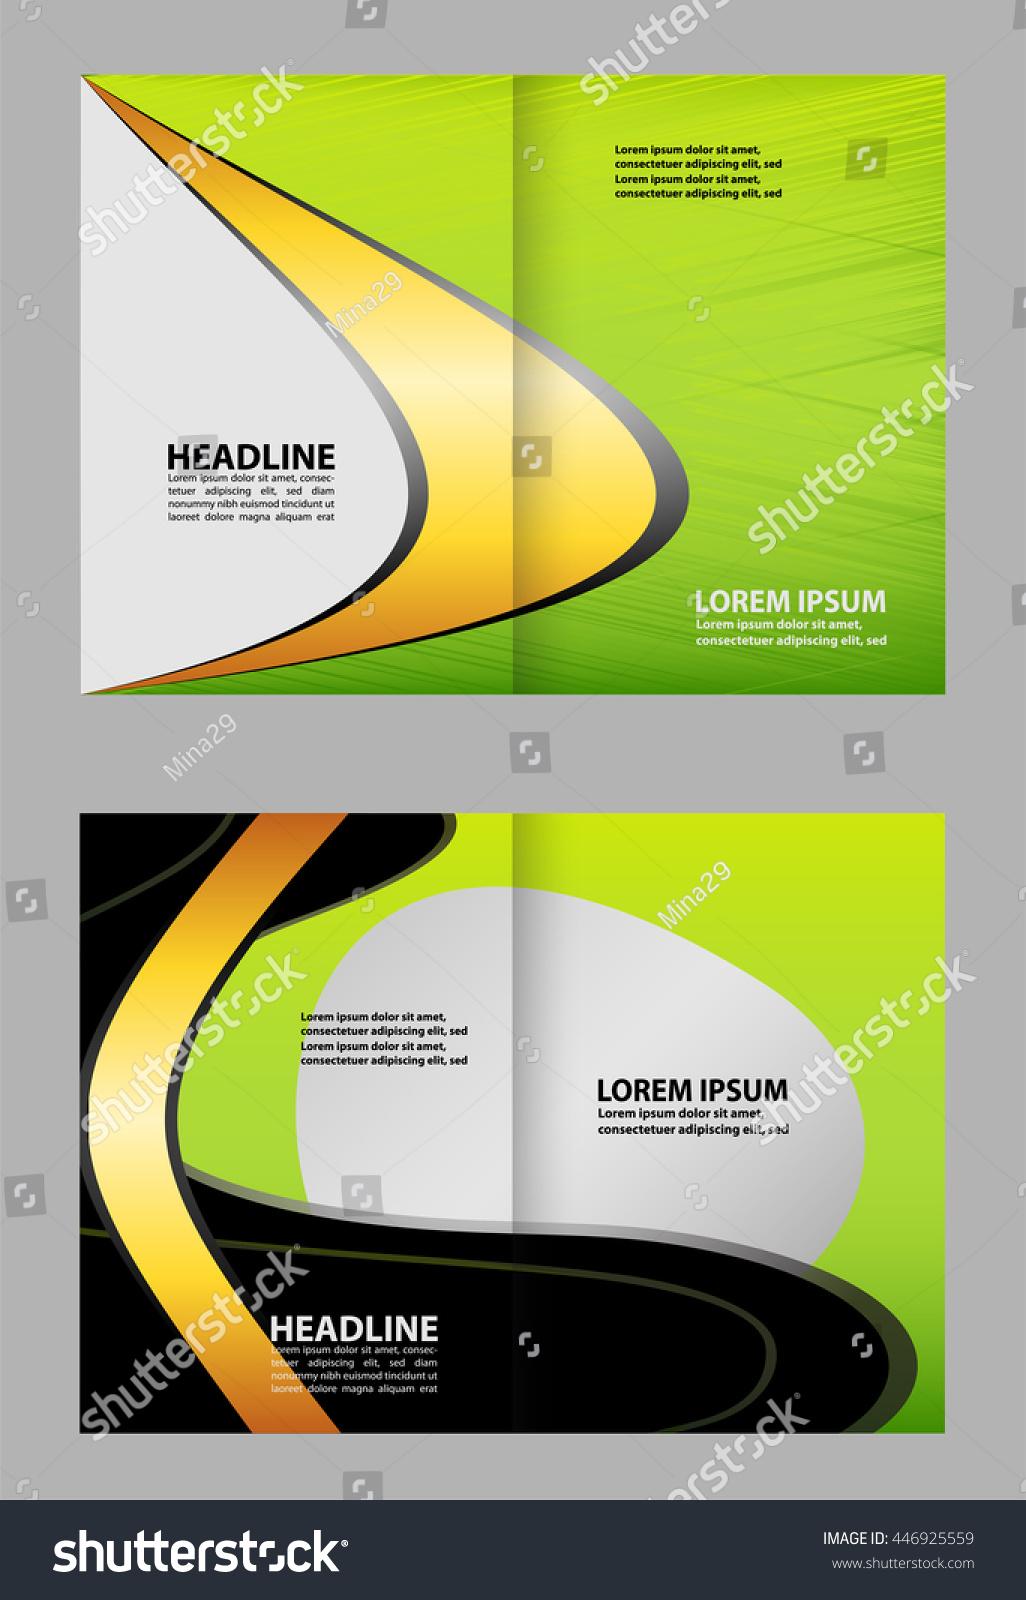 bifold brochure template design green color stock vector 446925559 shutterstock. Black Bedroom Furniture Sets. Home Design Ideas